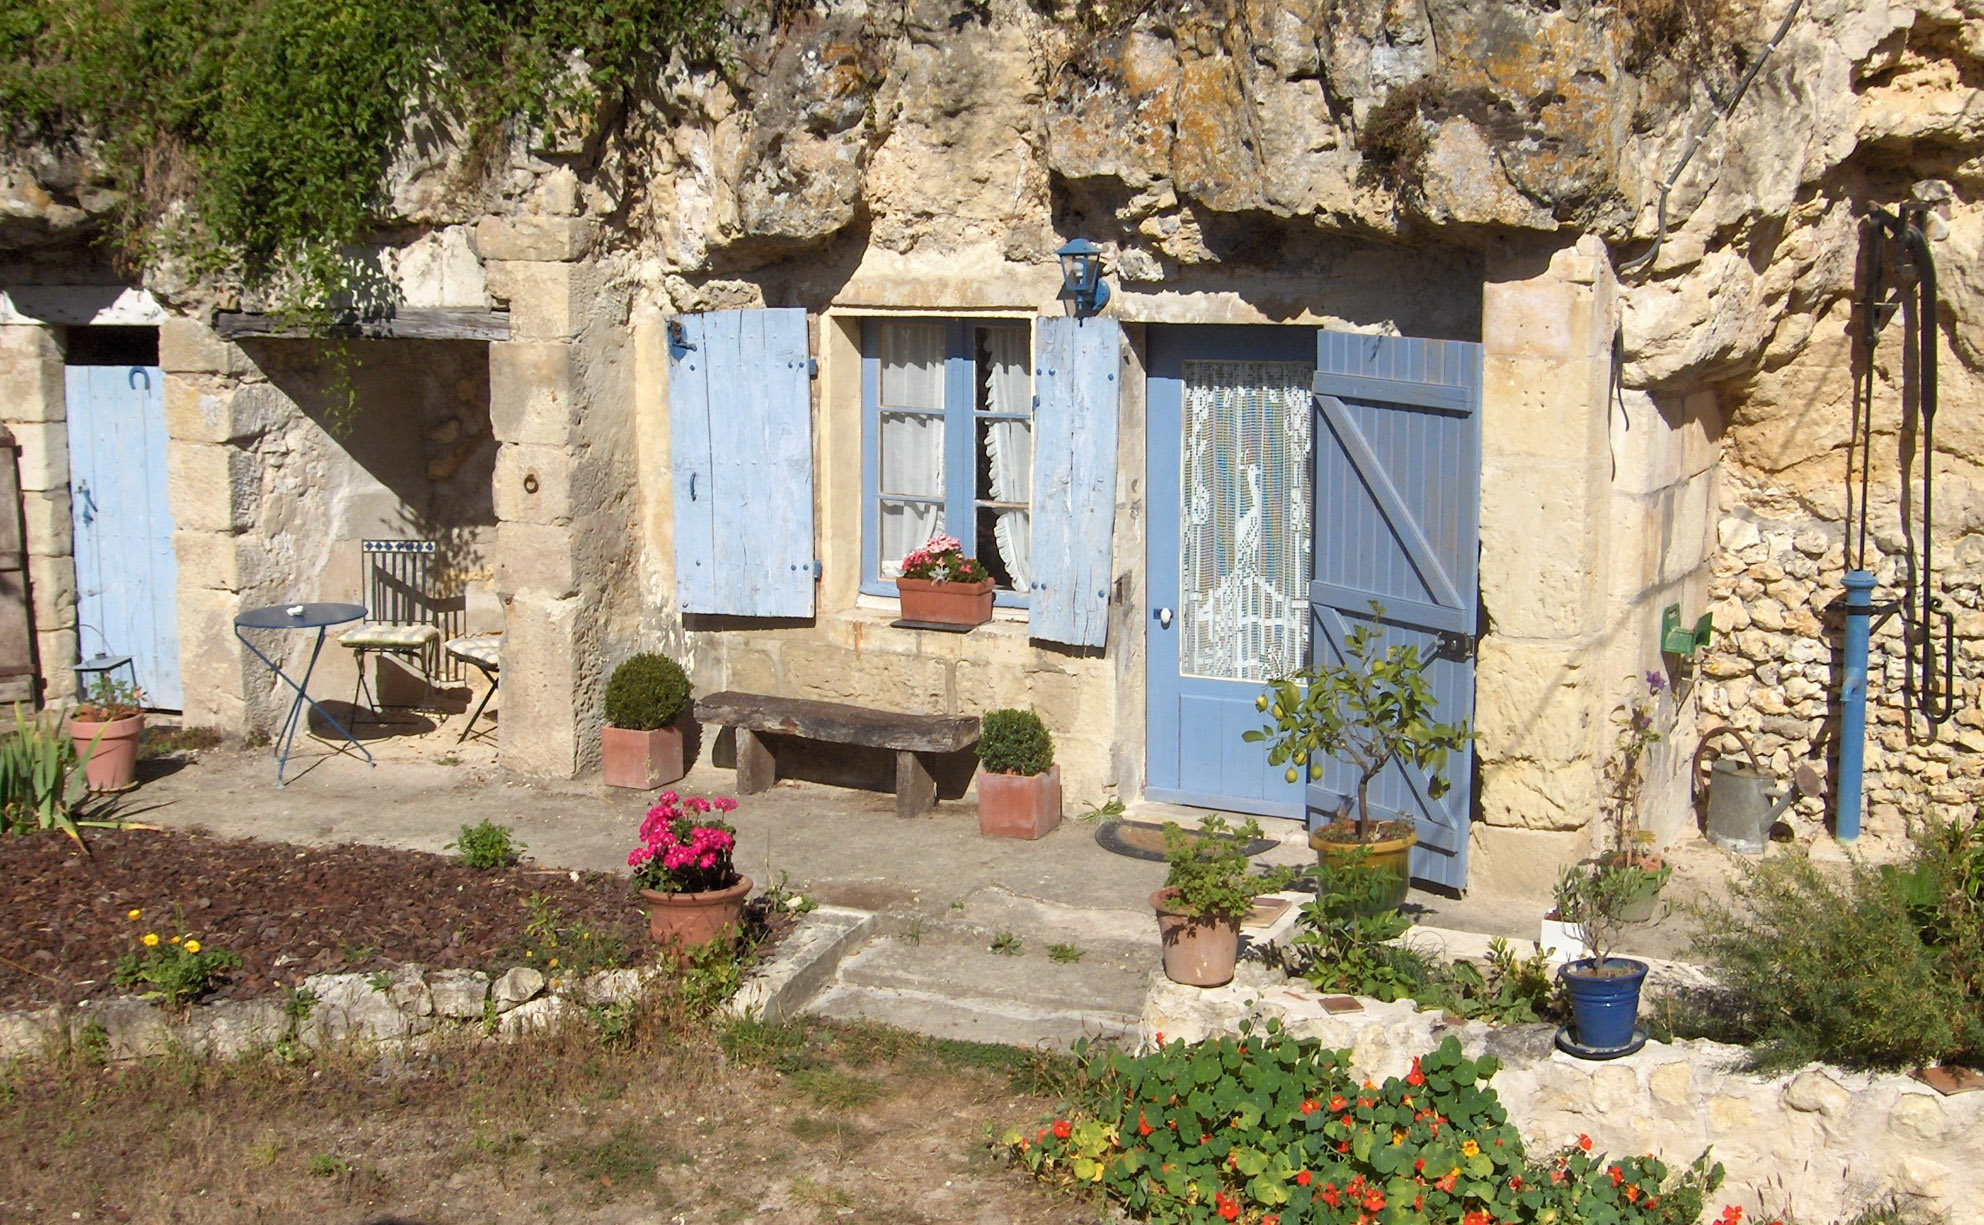 Le figuier des badinons for Chambre d hote loire valley